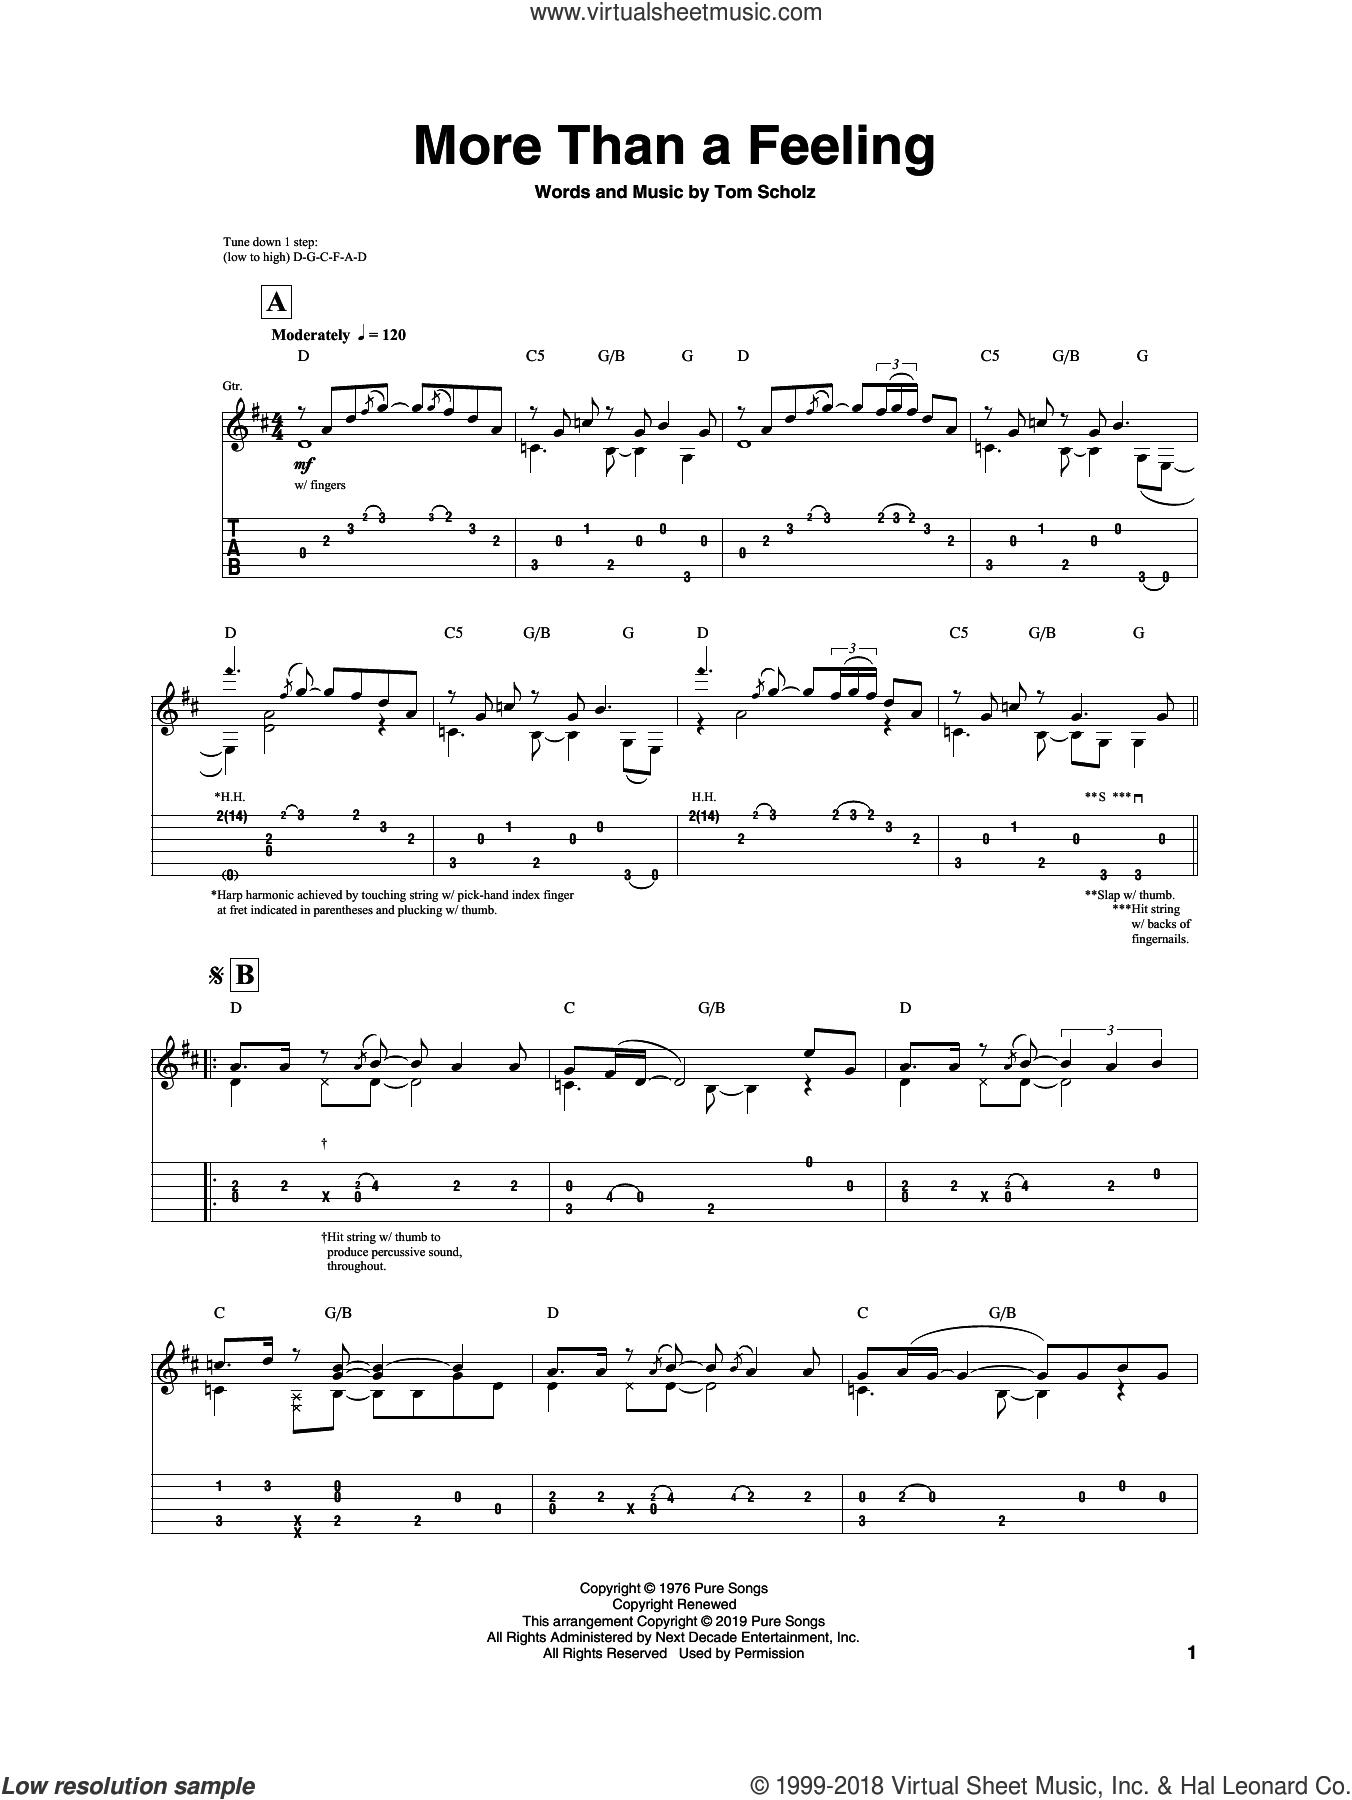 More Than A Feeling sheet music for guitar (tablature) by Boston, Igor Presnyakov and Tom Scholz, intermediate skill level